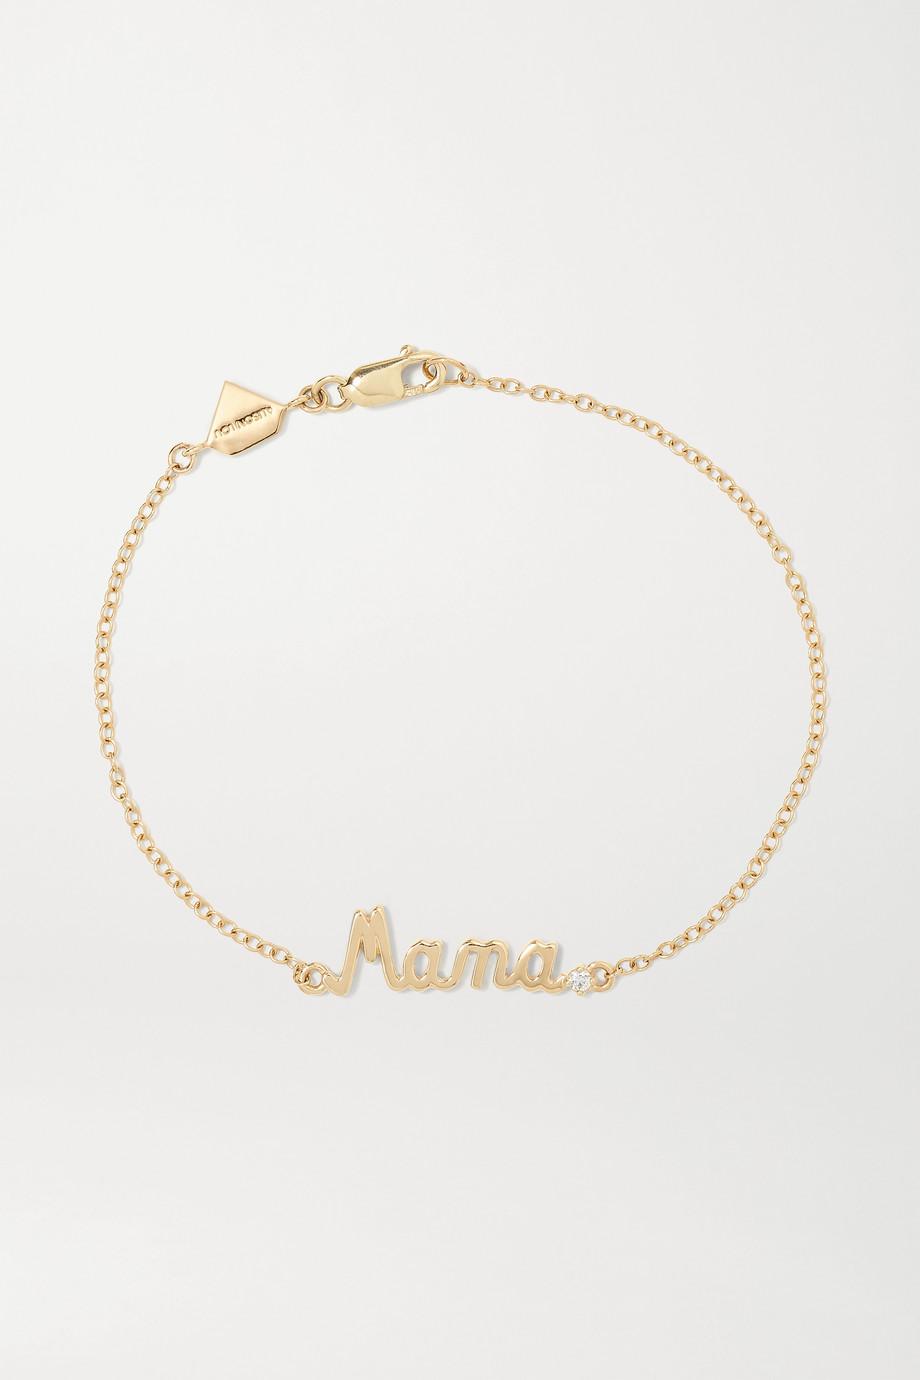 Alison Lou Mama Armband aus 14 Karat Gold mit einem Diamanten